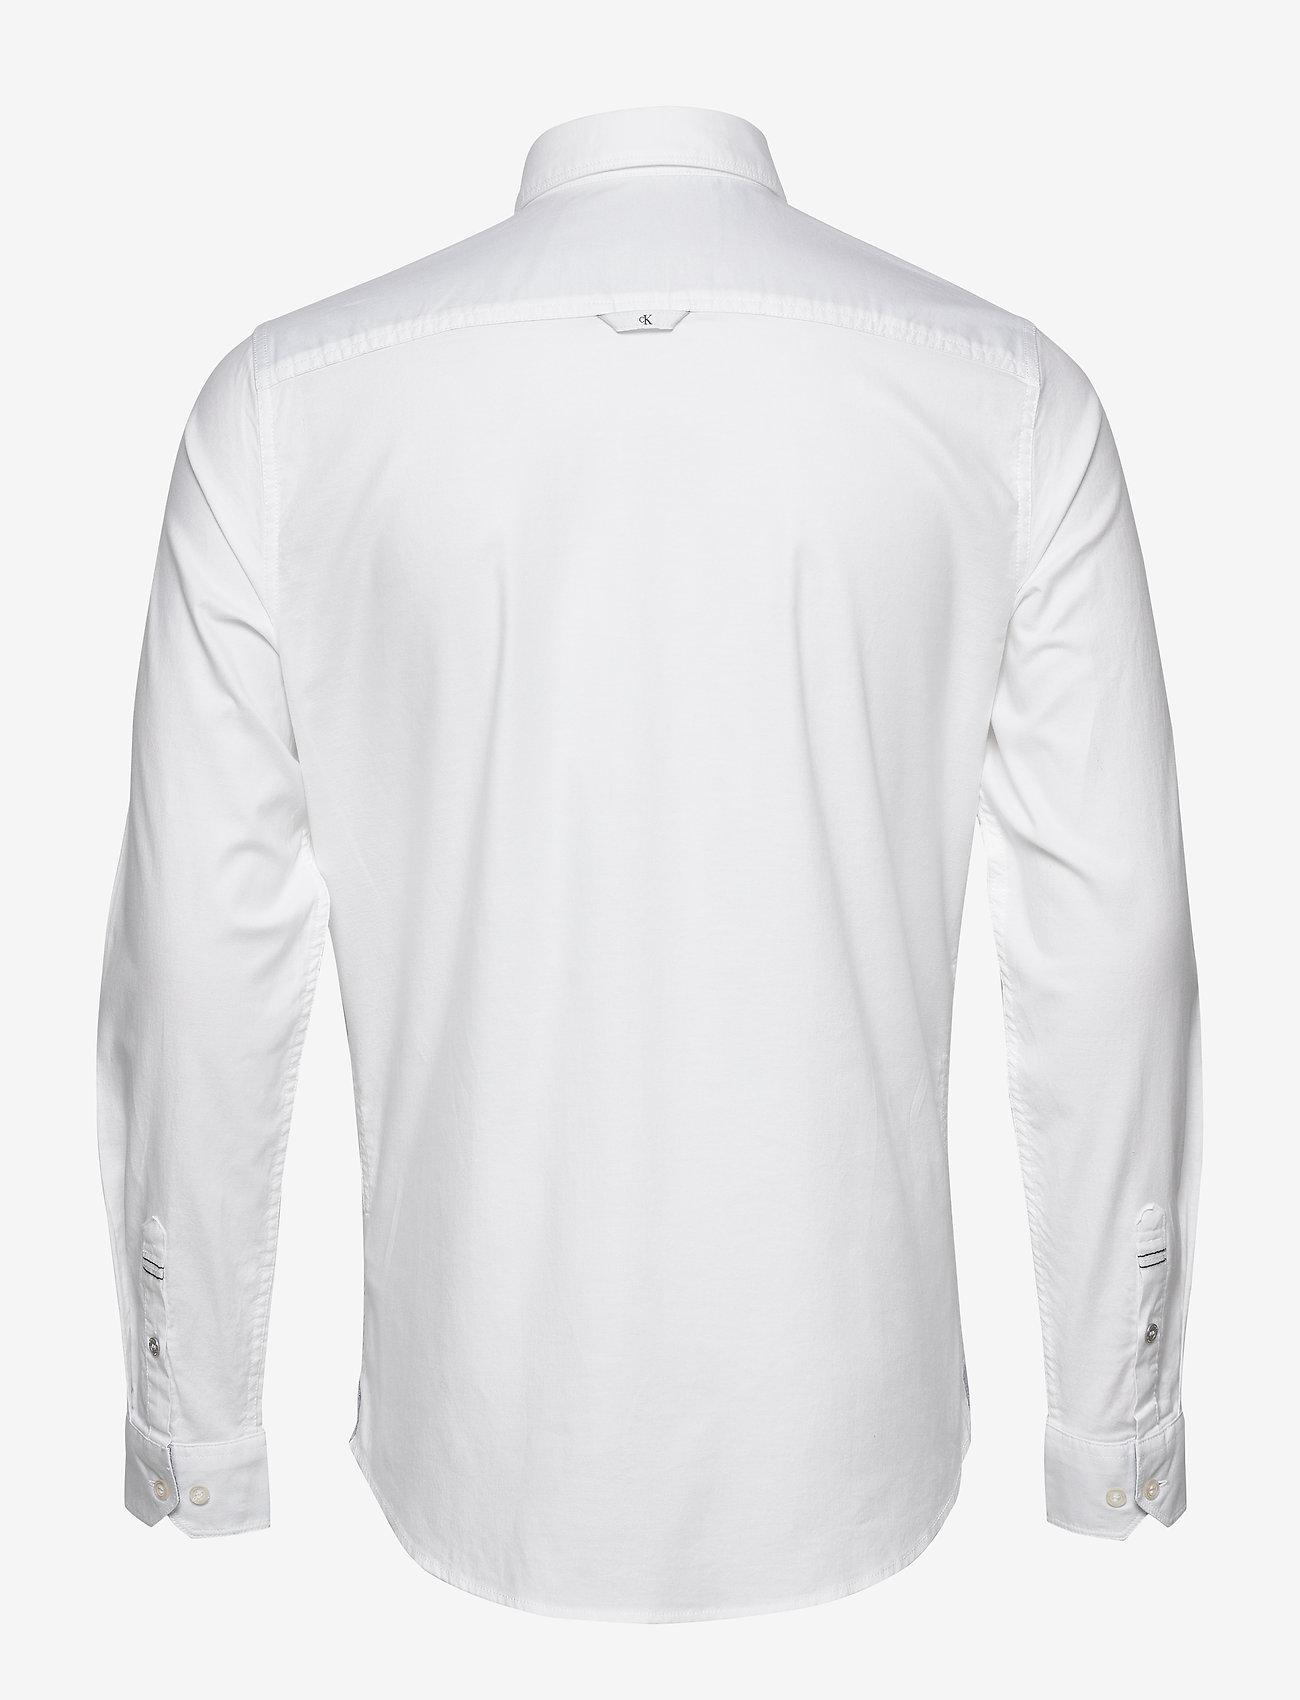 Calvin Klein Jeans - CHAMBRAY SLIM STRETCH - basic overhemden - bright white - 1